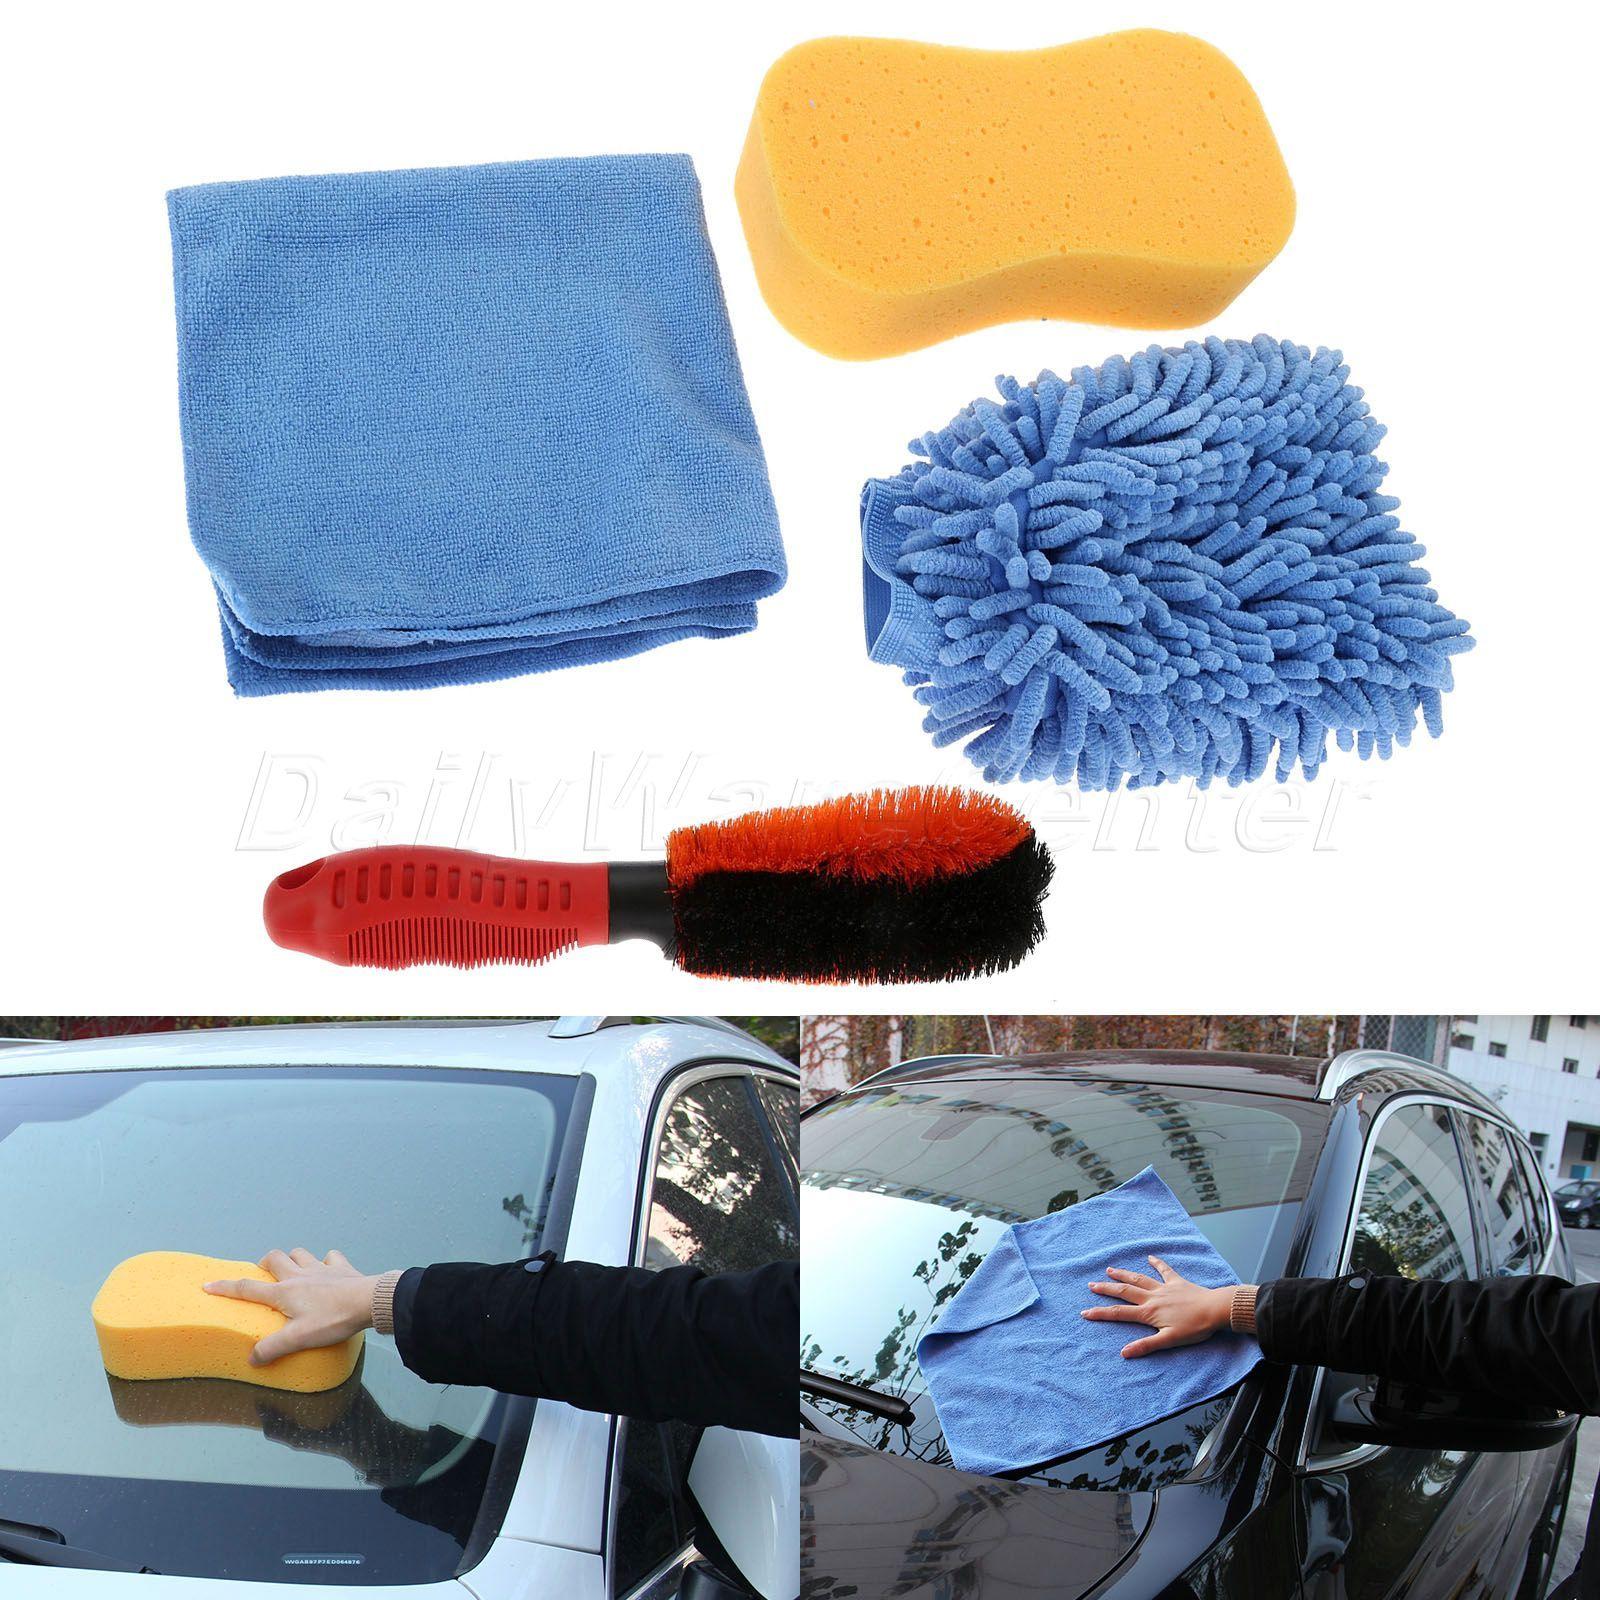 Car Cleaing Tool Kit 1* <font><b>Tire</b></font> Brush, 1* Microfiber Towel, 1* Tyre Brush Sponge, 1* Car Wash Glove For Wash Car Detailing Polish